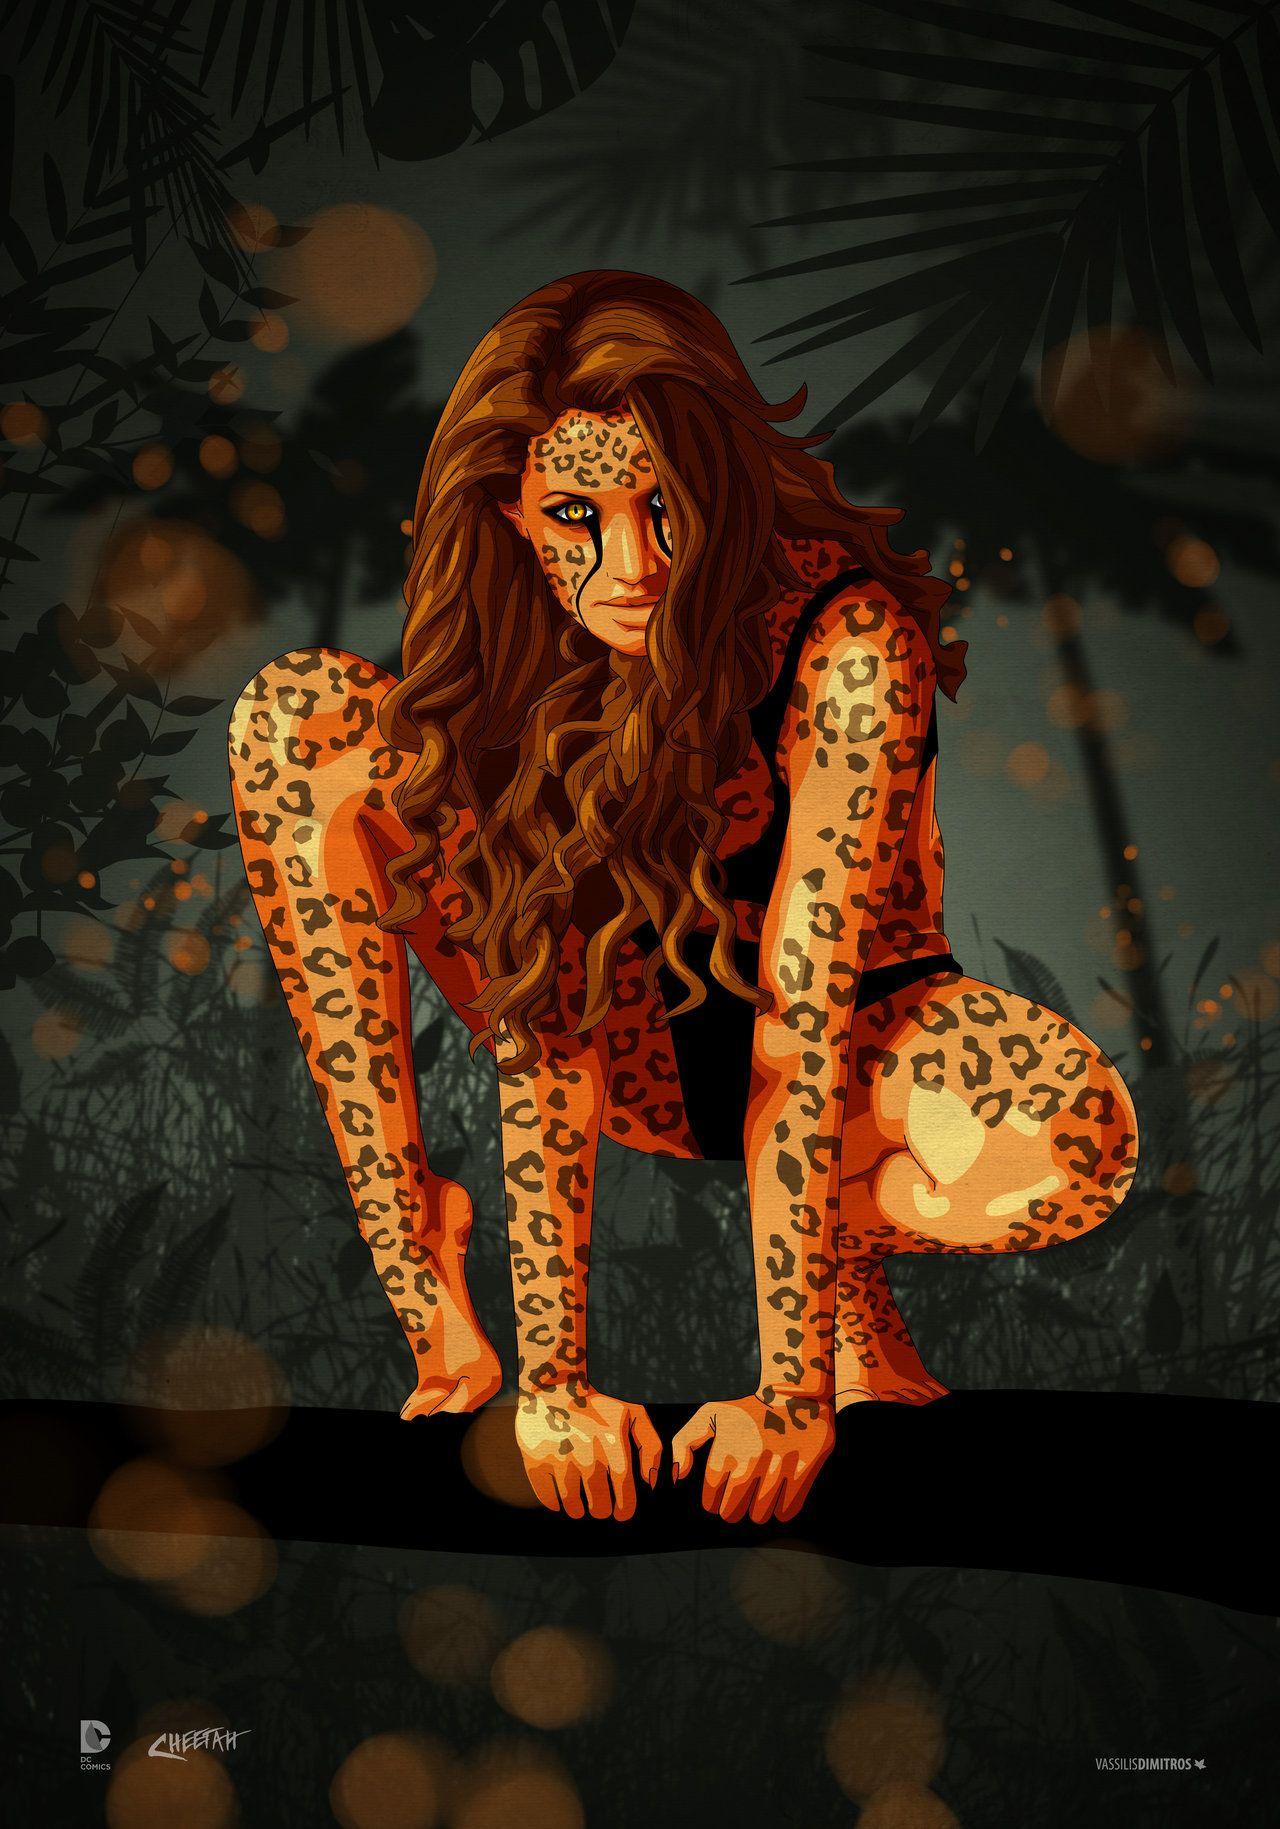 Cheetah Cheetah Wonder Woman Cheetah Comics Cheetah Dc Comics